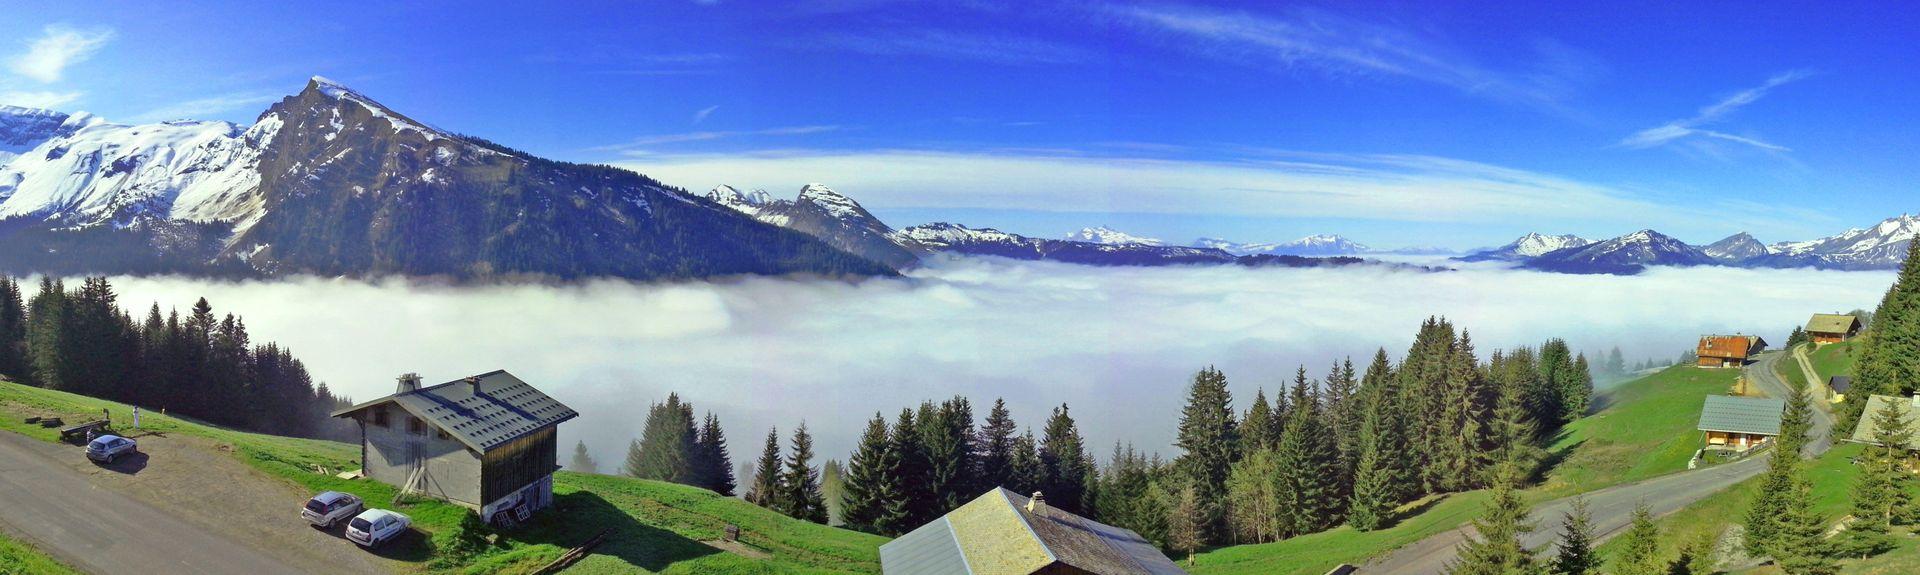 Morzine, Haute-Savoie (område), Frankrike